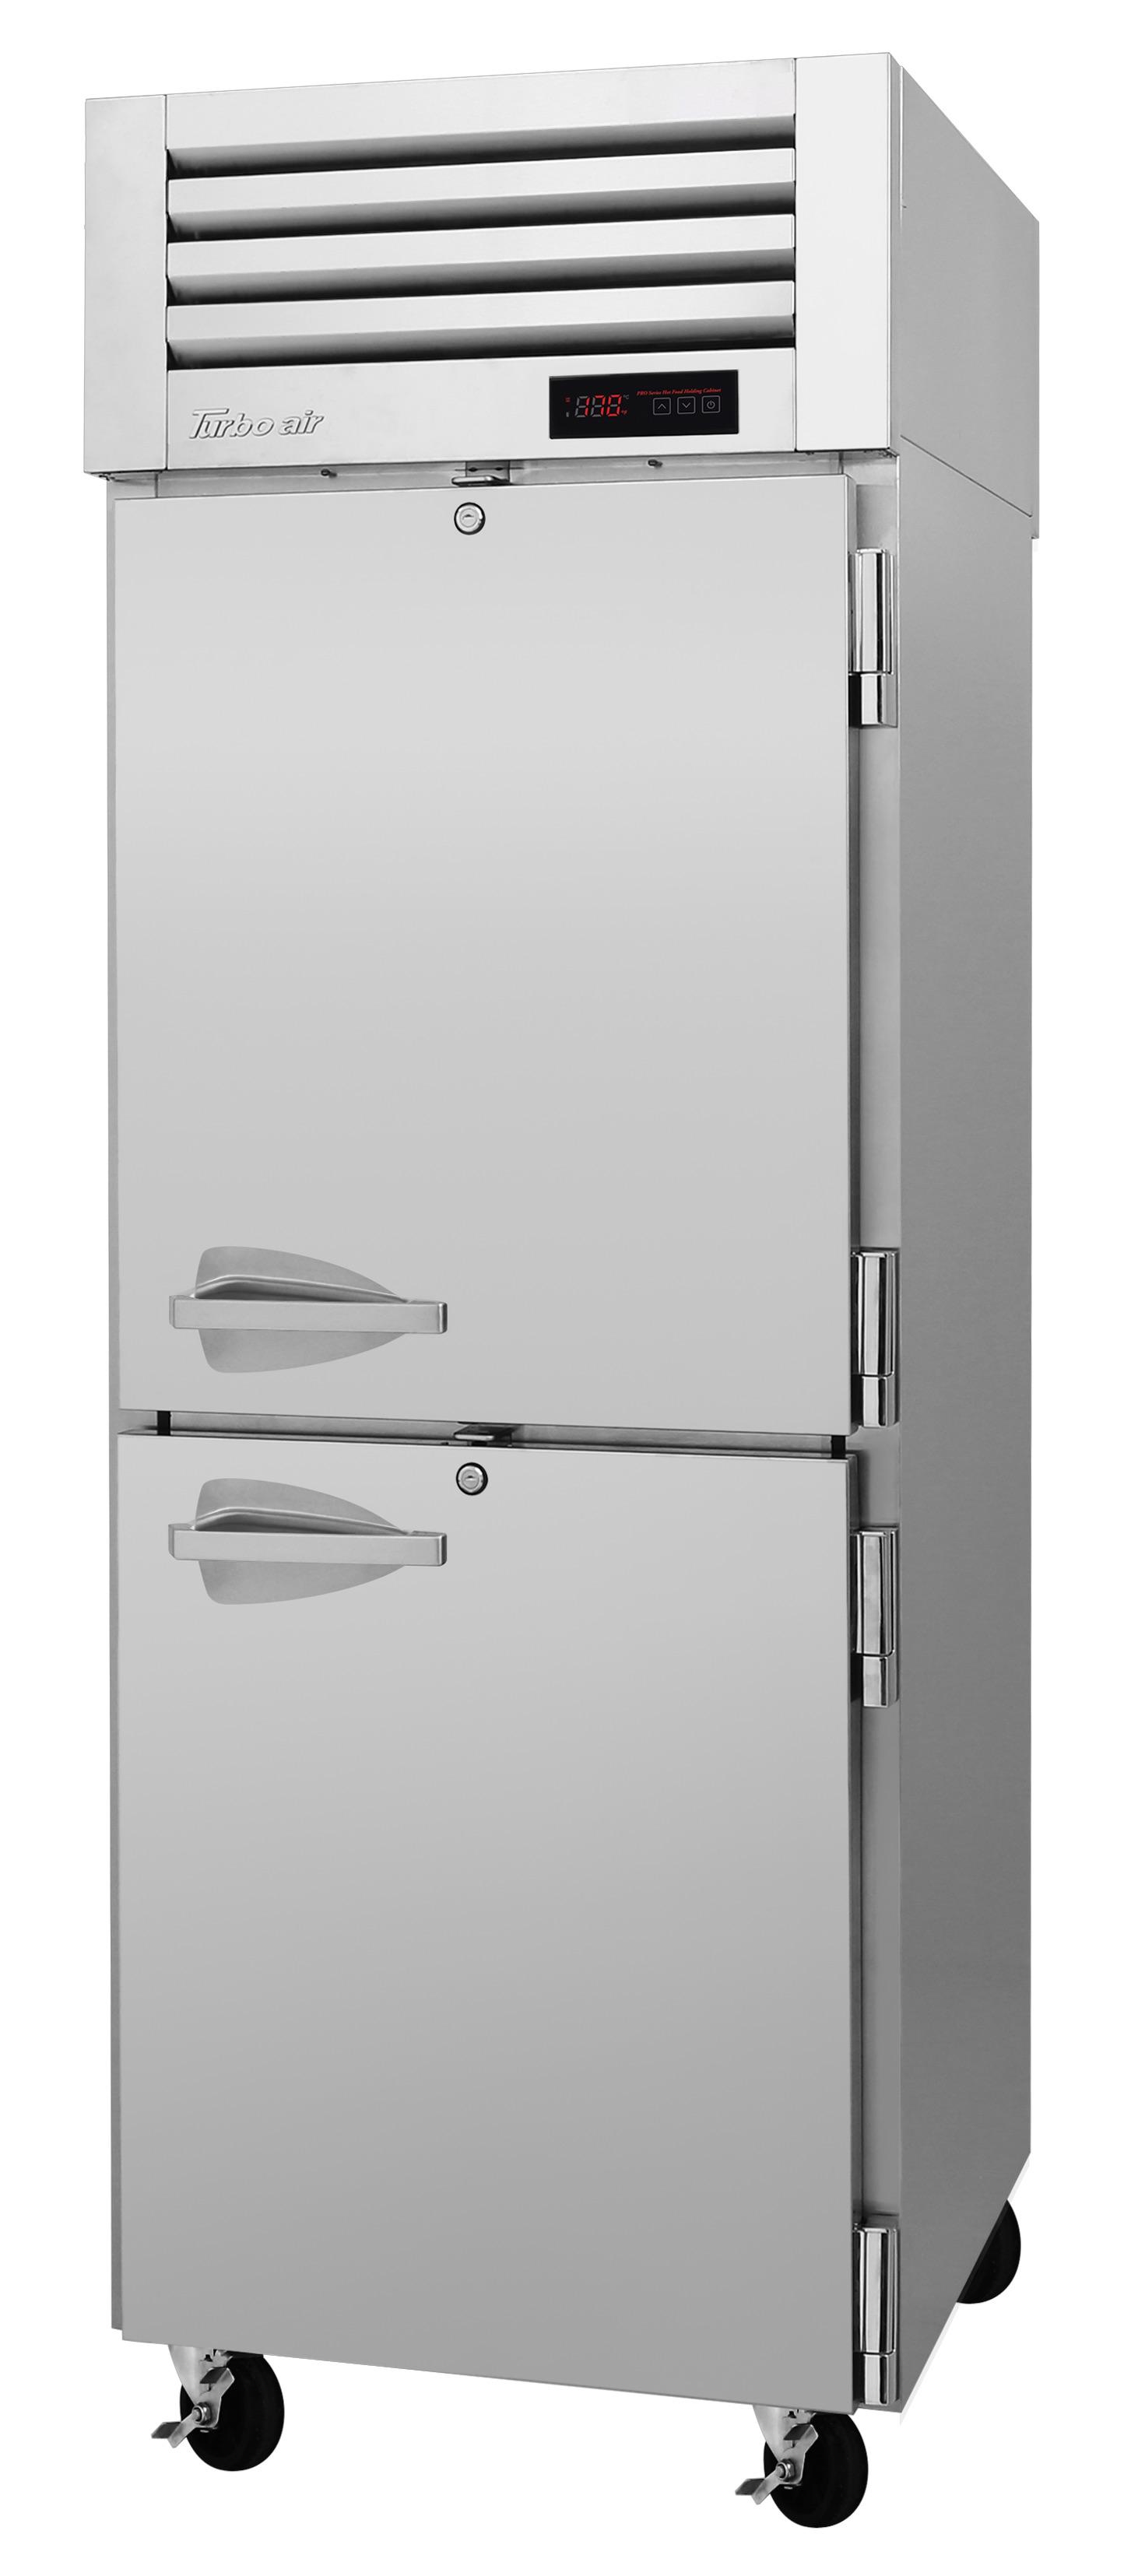 Turbo Air PRO-26-2H2 pro series - reach in refrigerator